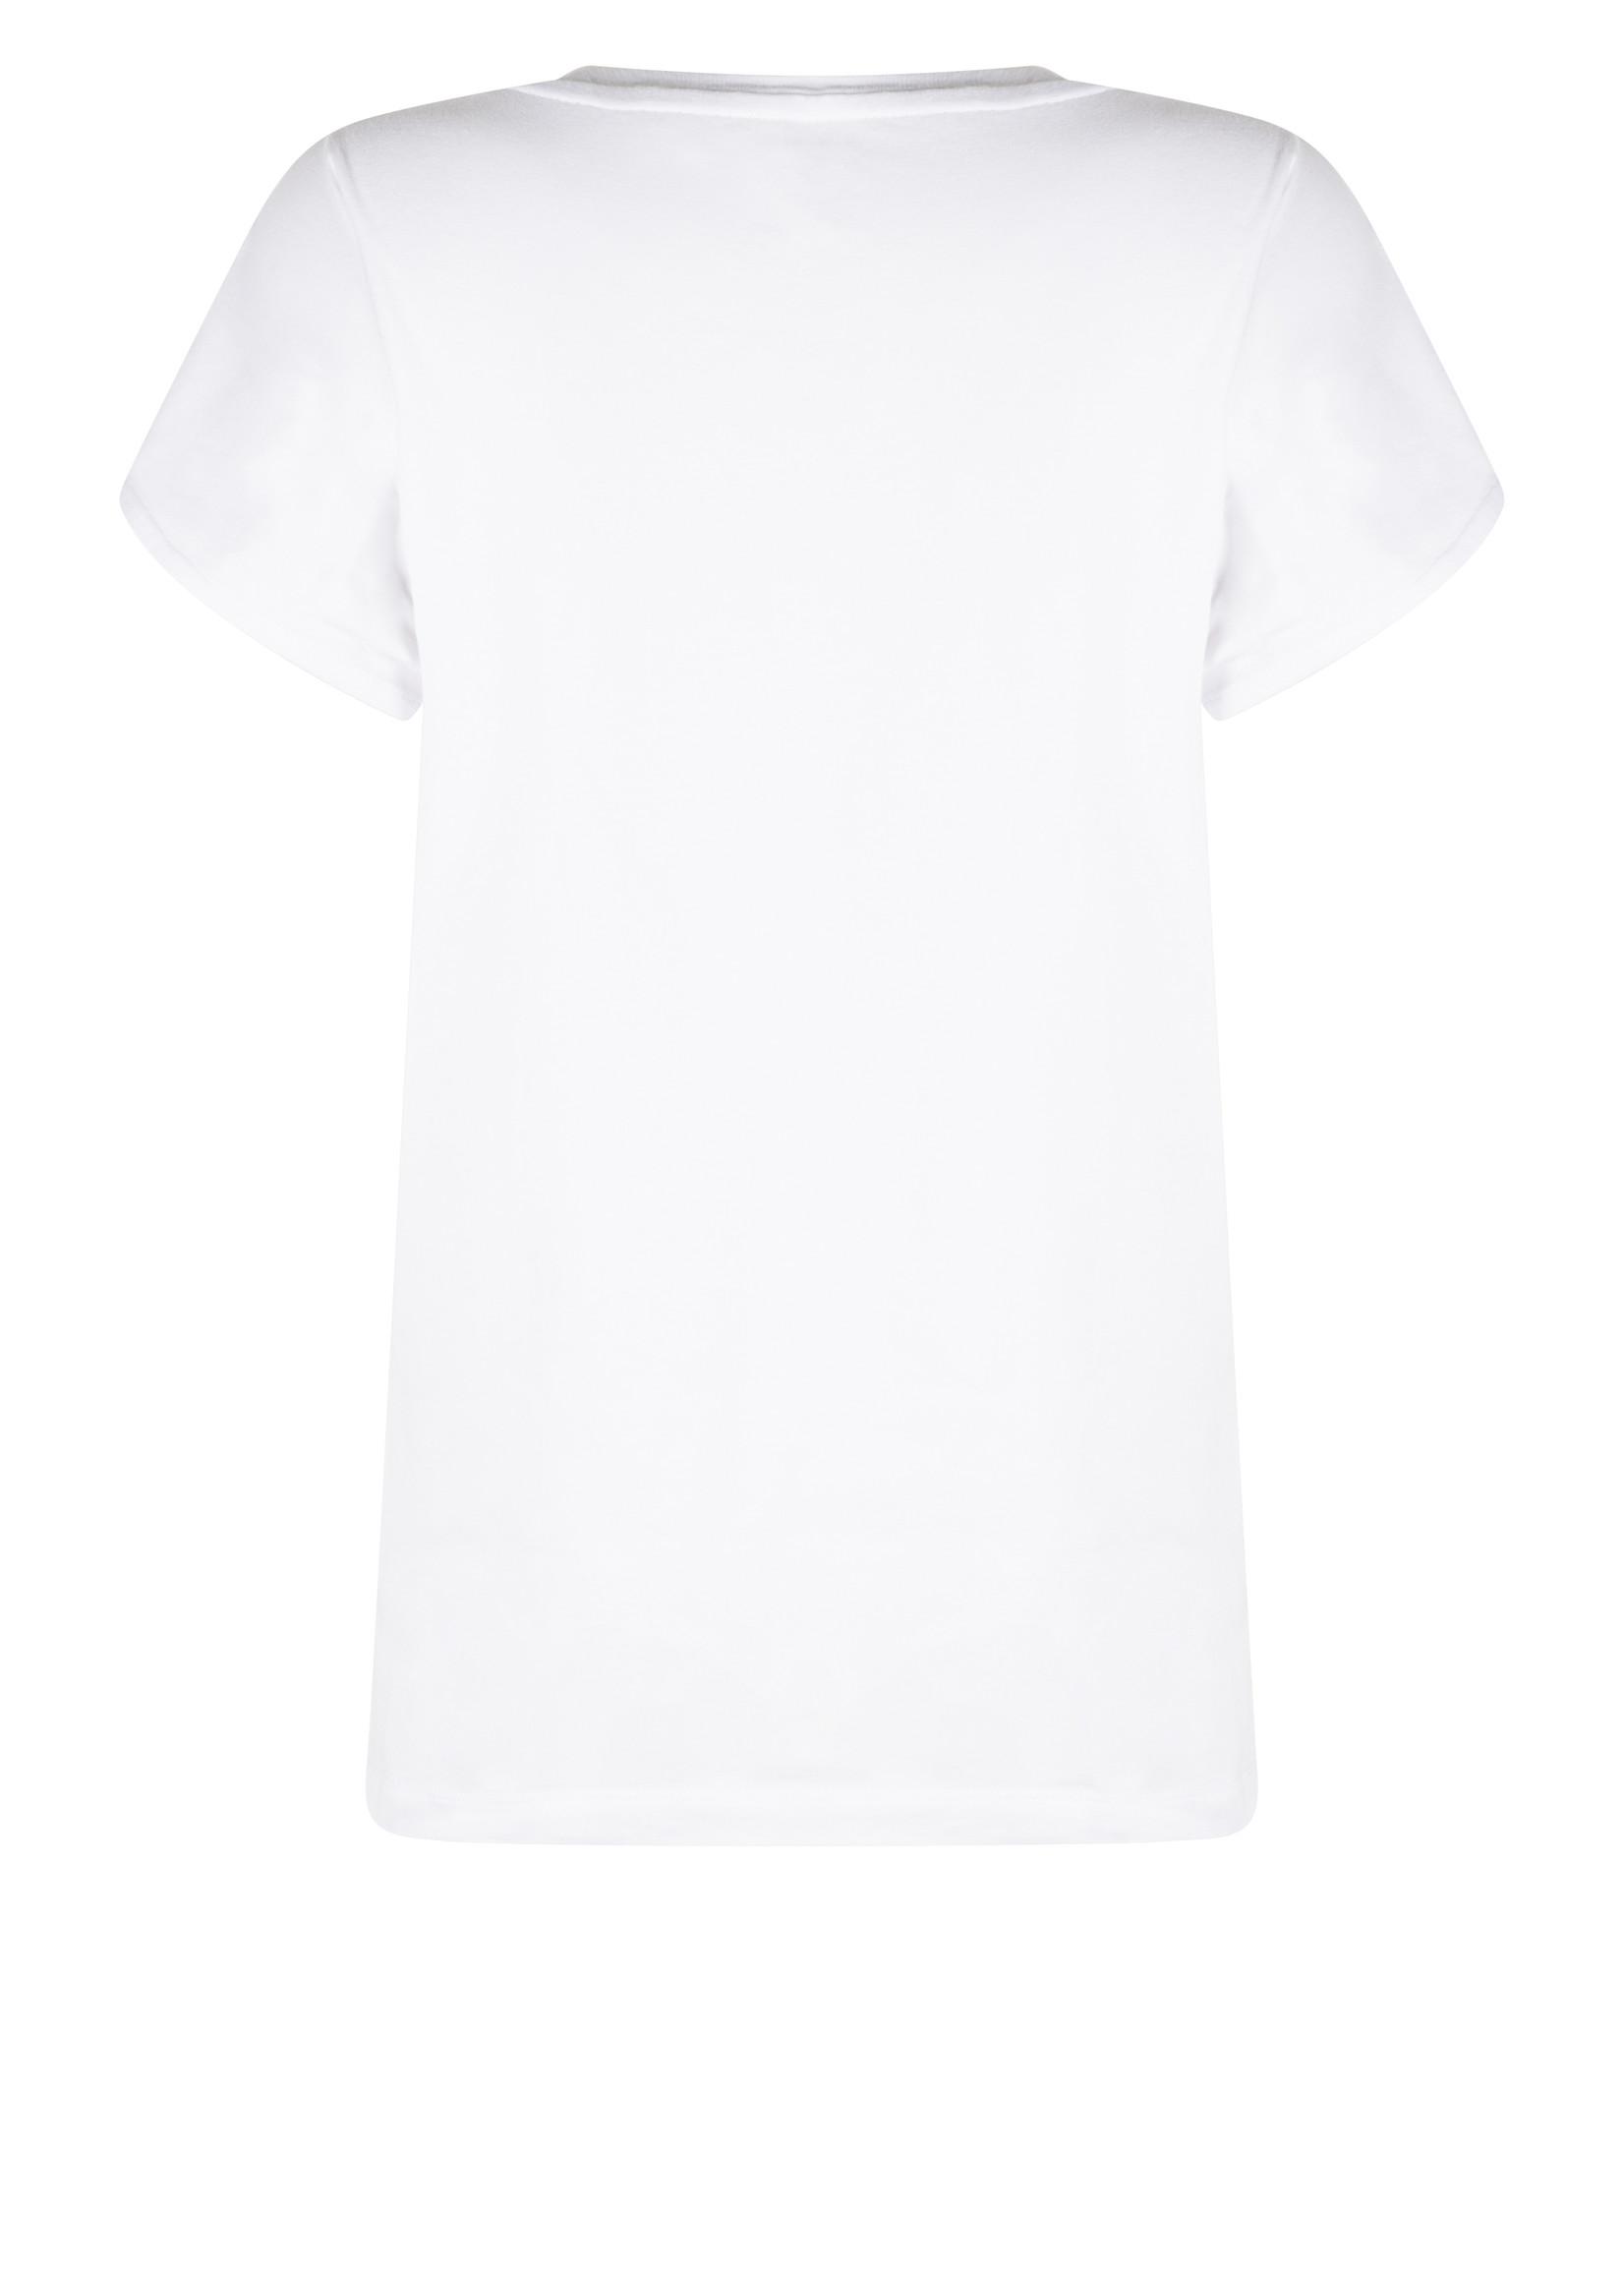 Zoso T-shirt met print en pailletten